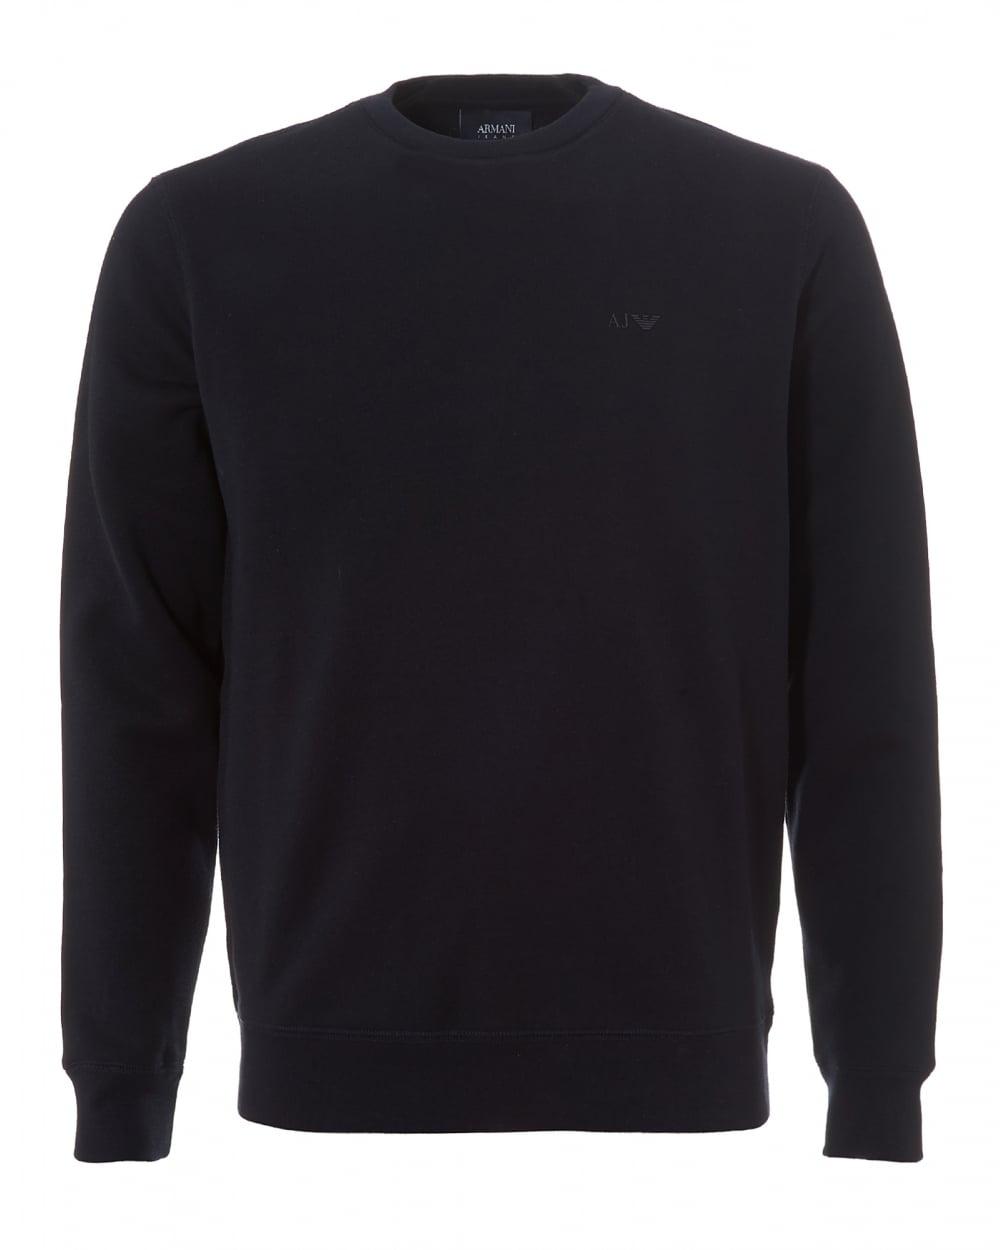 Armani Jeans Mens Basic Sweatshirt Crew Neck Navy Blue Jumper